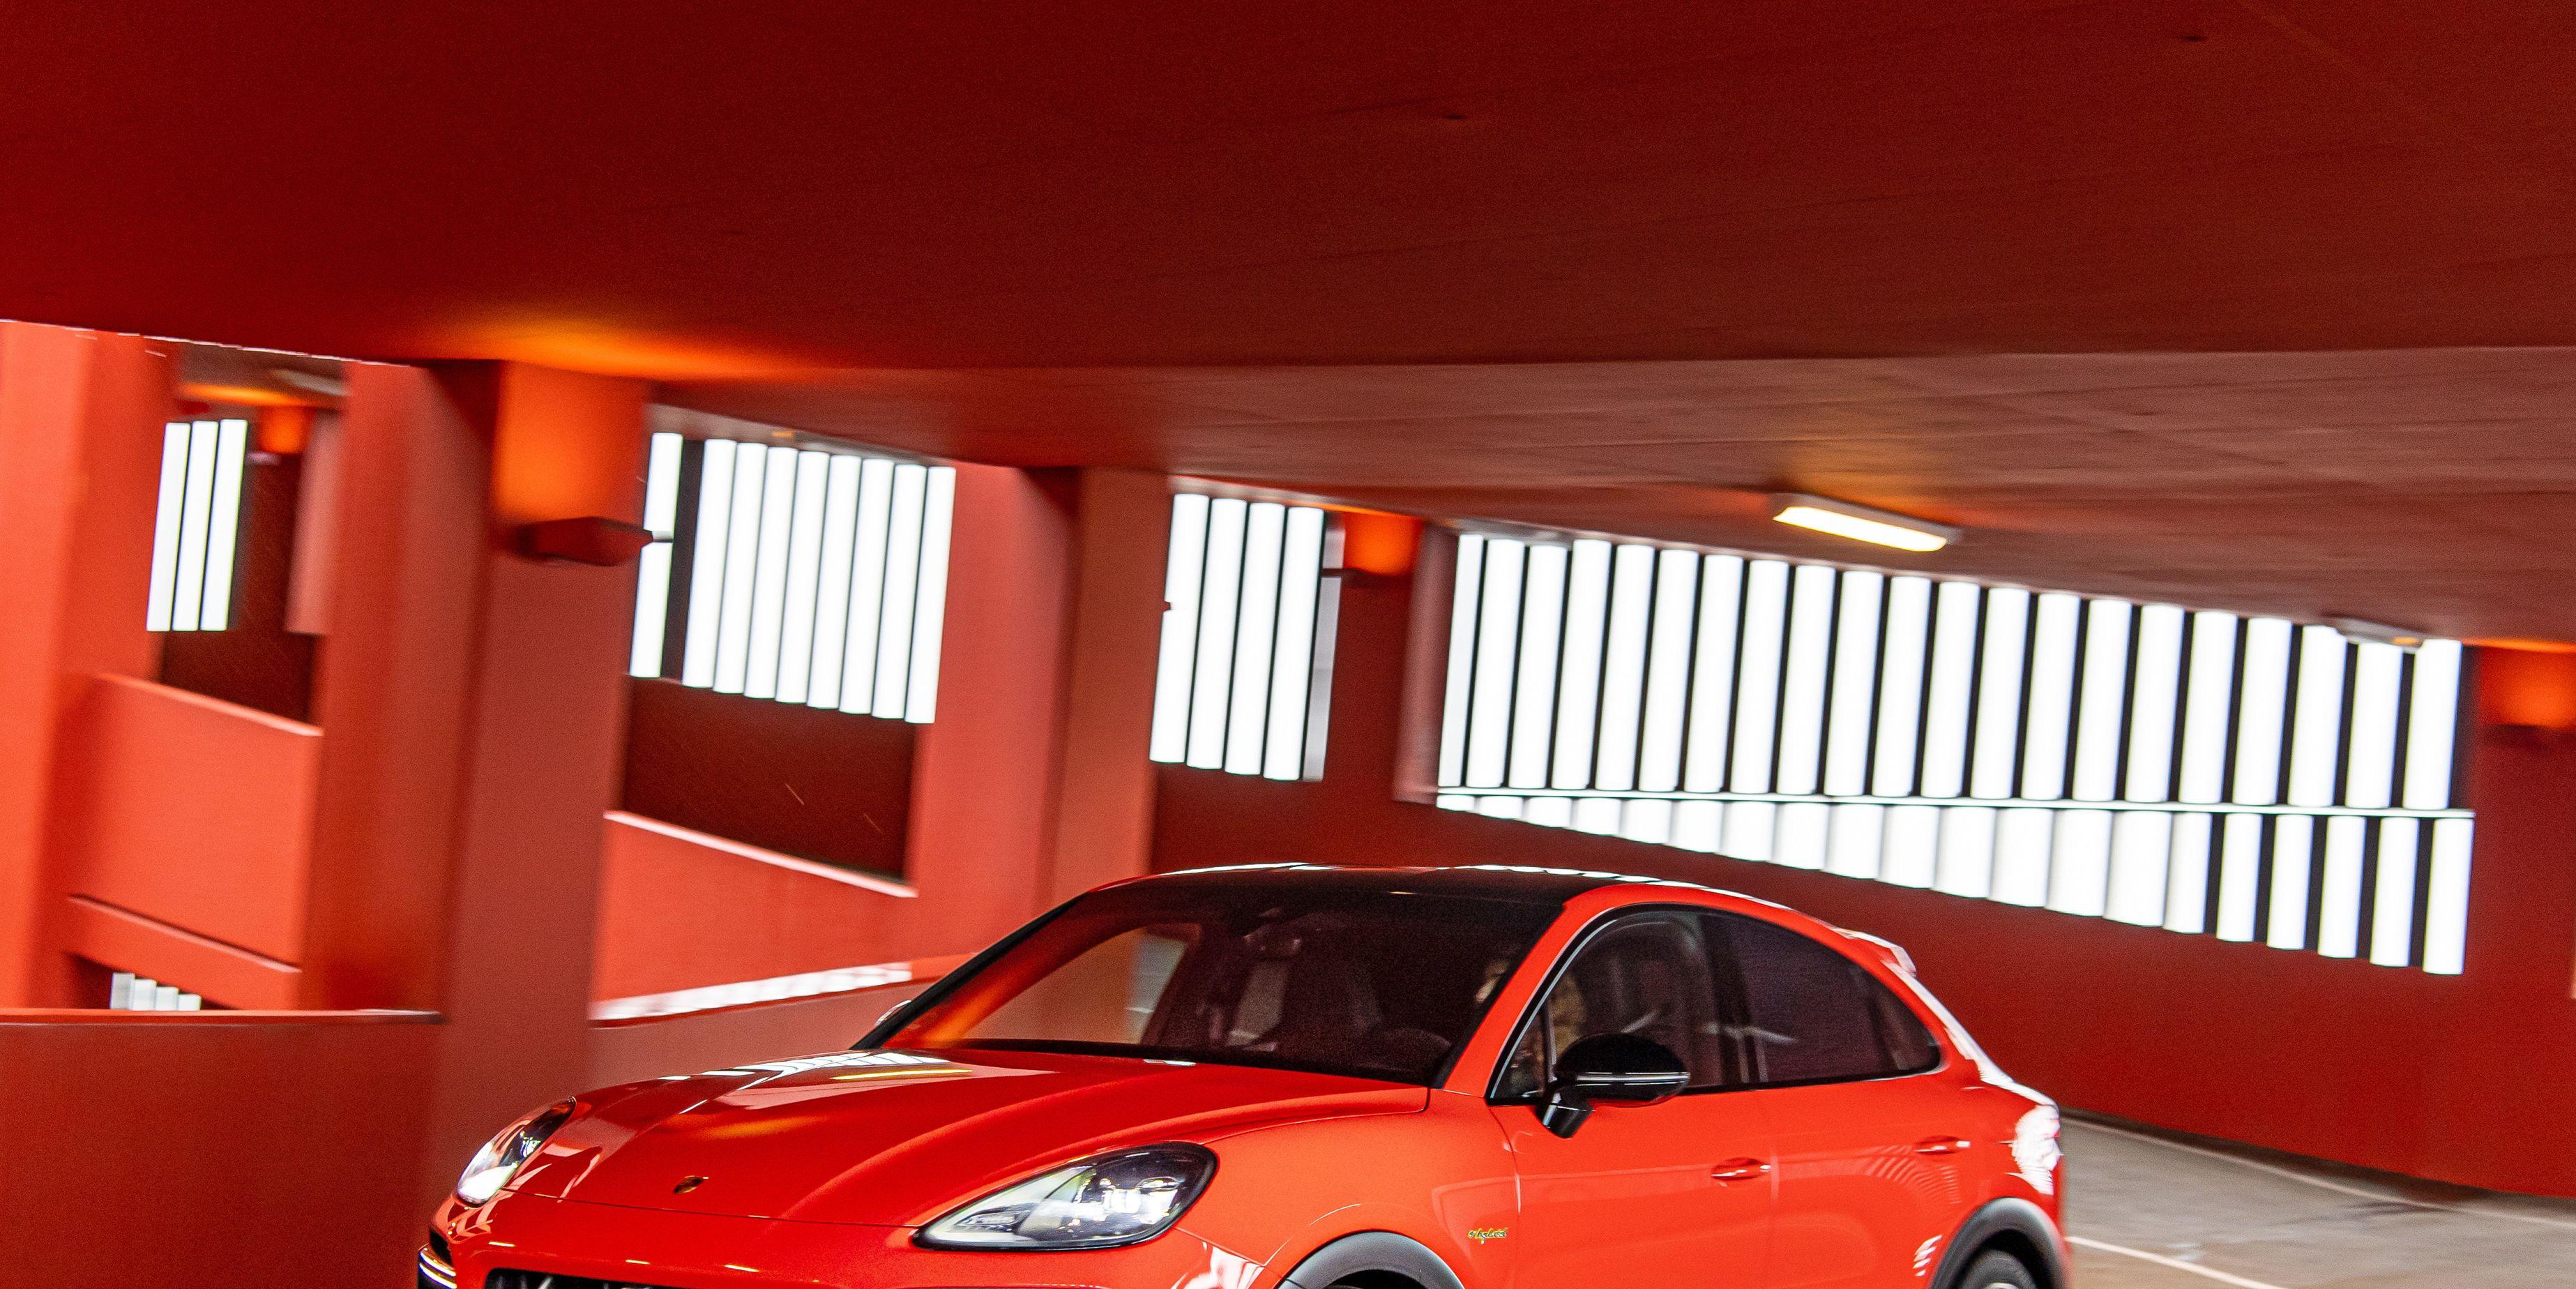 2020 Porsche Cayenne Turbo S E Hybrid Coupe Raises Questions Raises Hell News Akmi